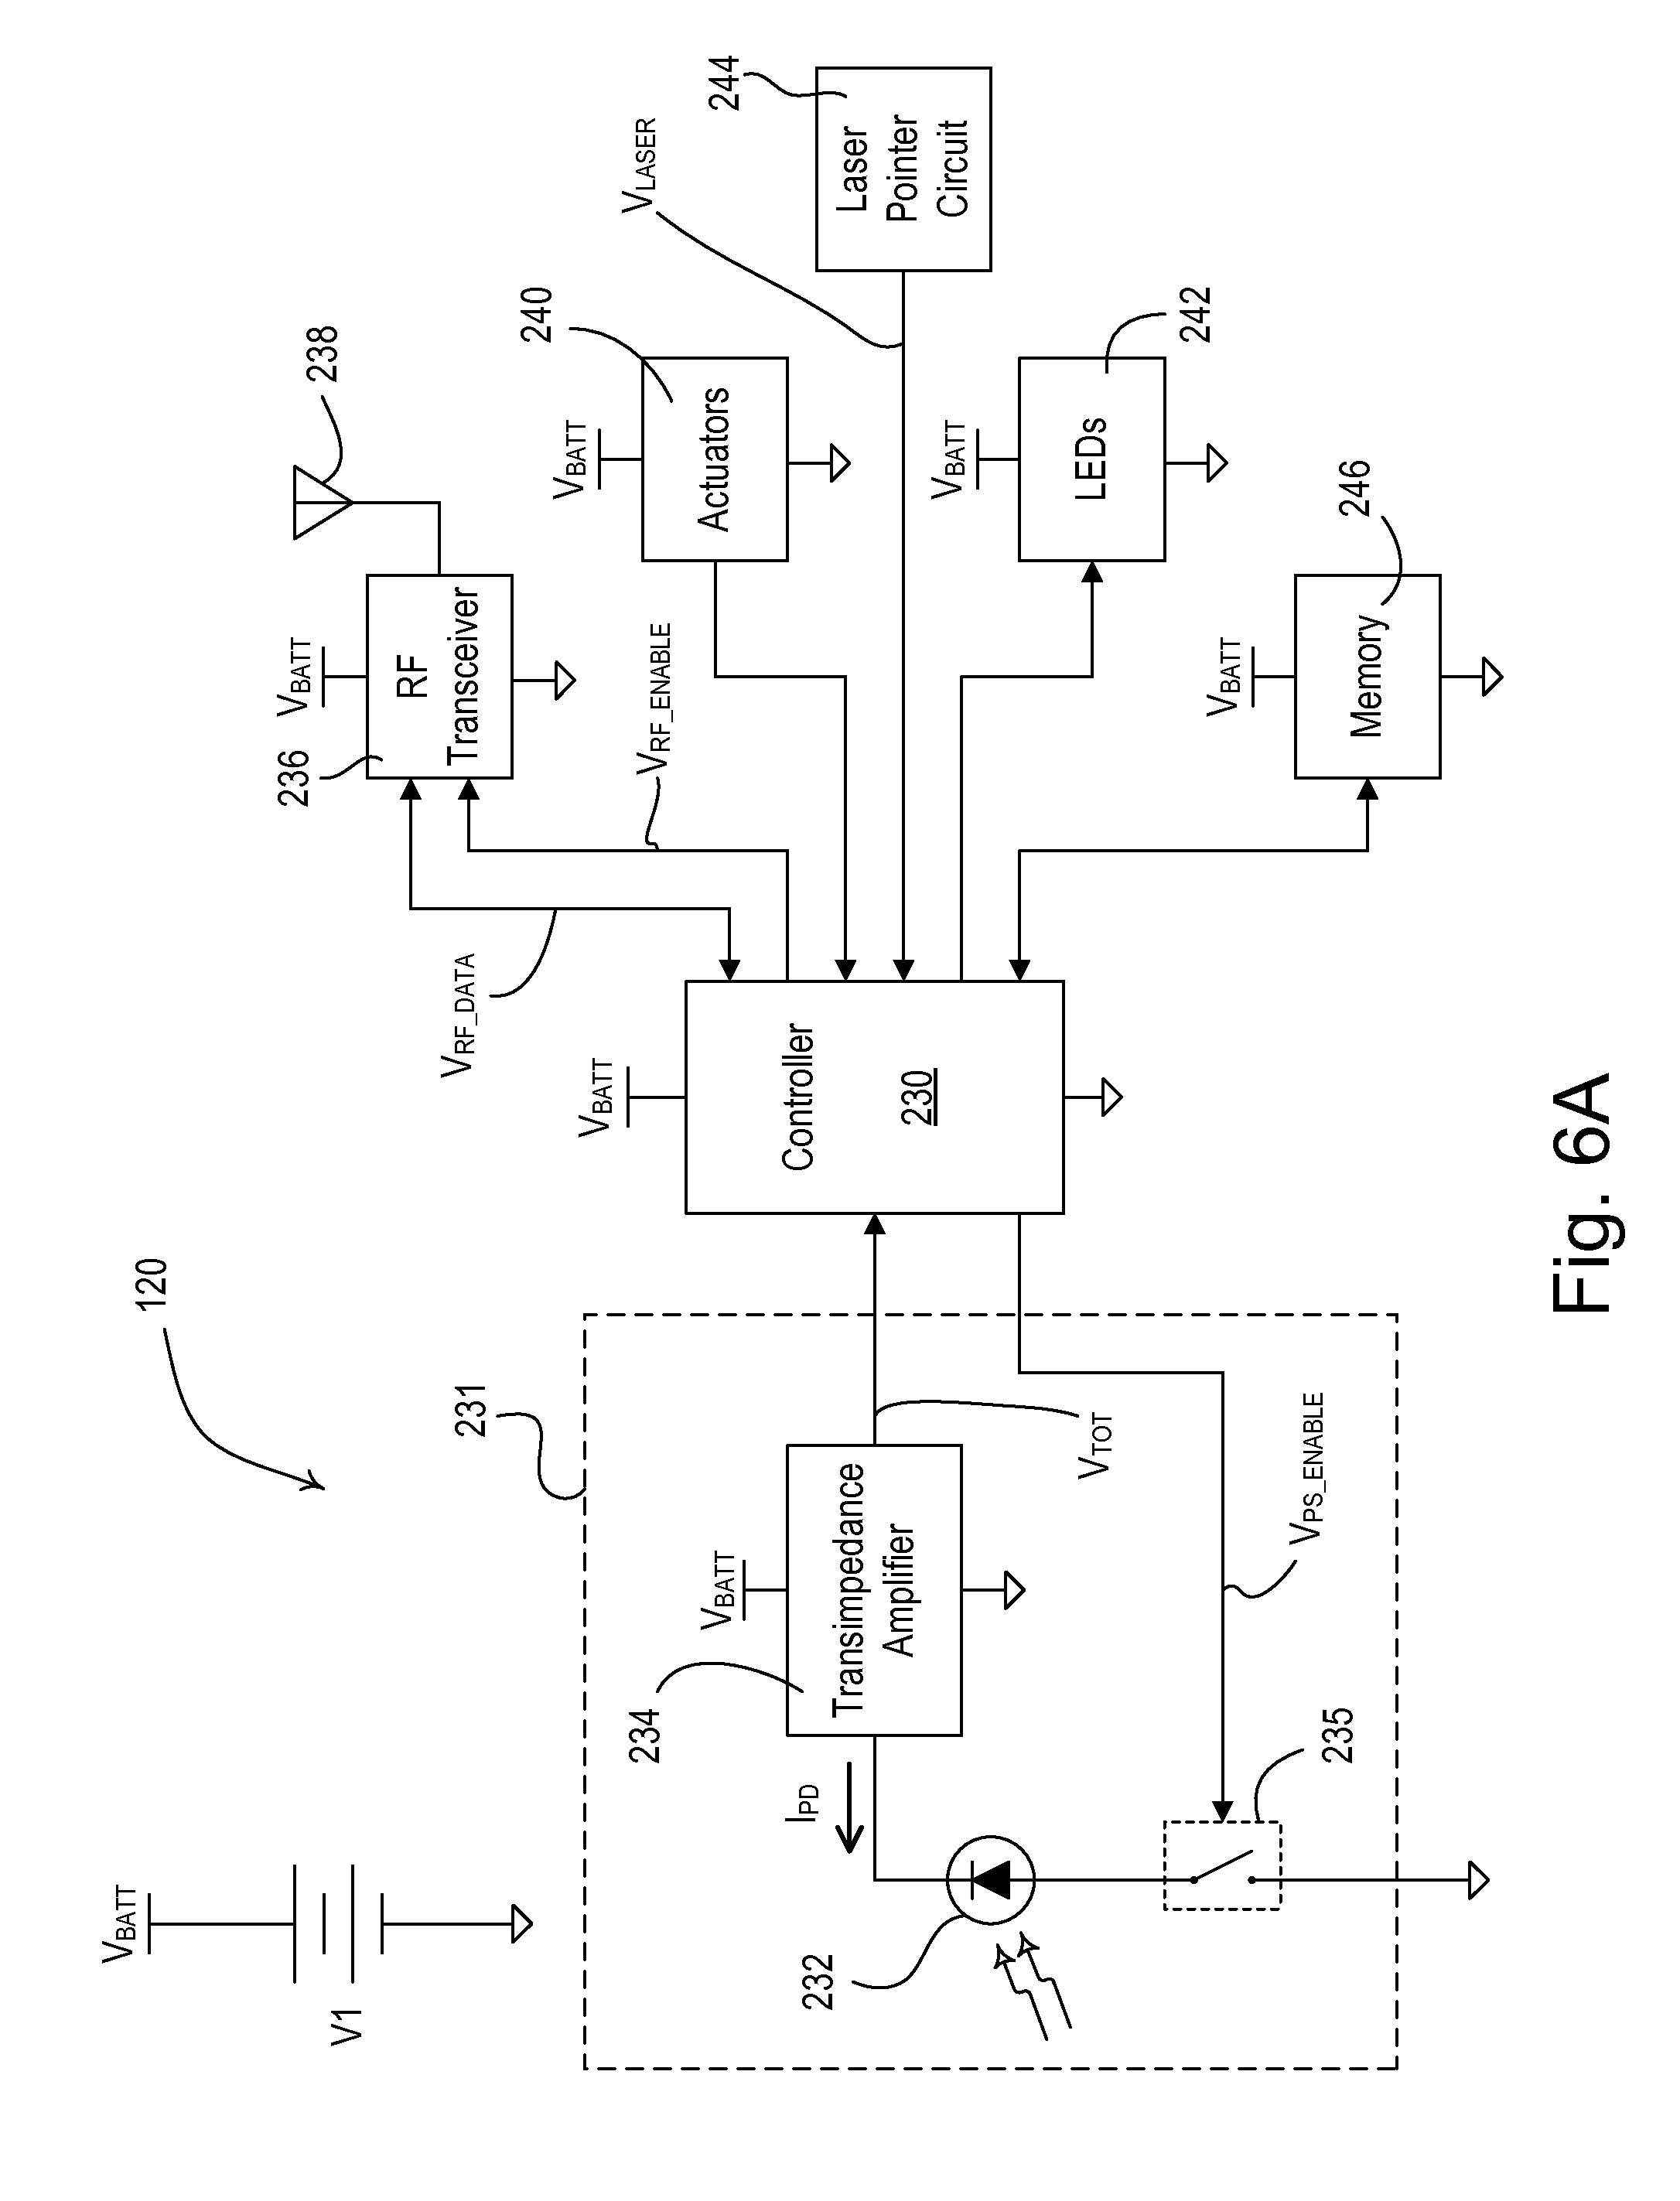 Patent Us20100244709 Wireless Battery Powered Daylight Sensor Lutron Mar Wiring Diagram Drawing